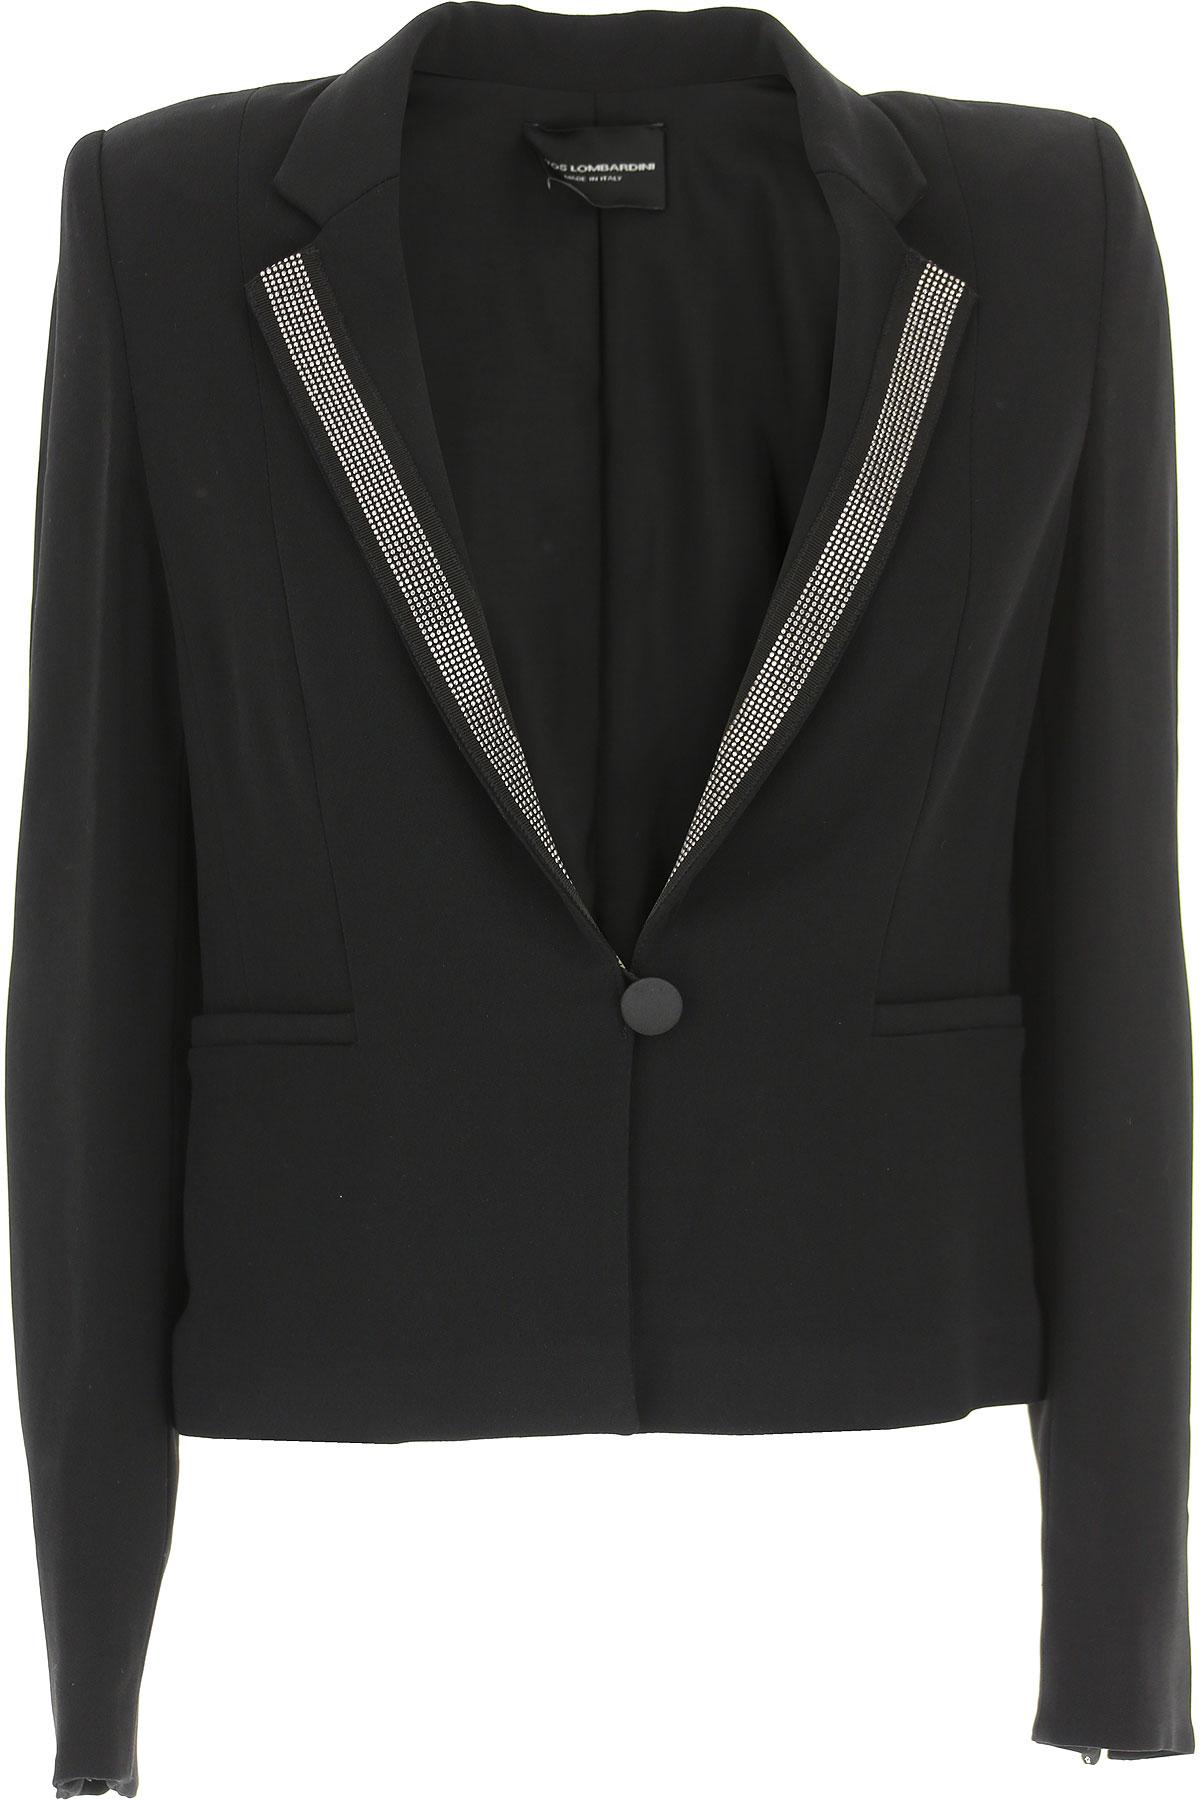 Image of Atos Lombardini Jacket for Women, Black, Viscose, 2017, 10 6 8